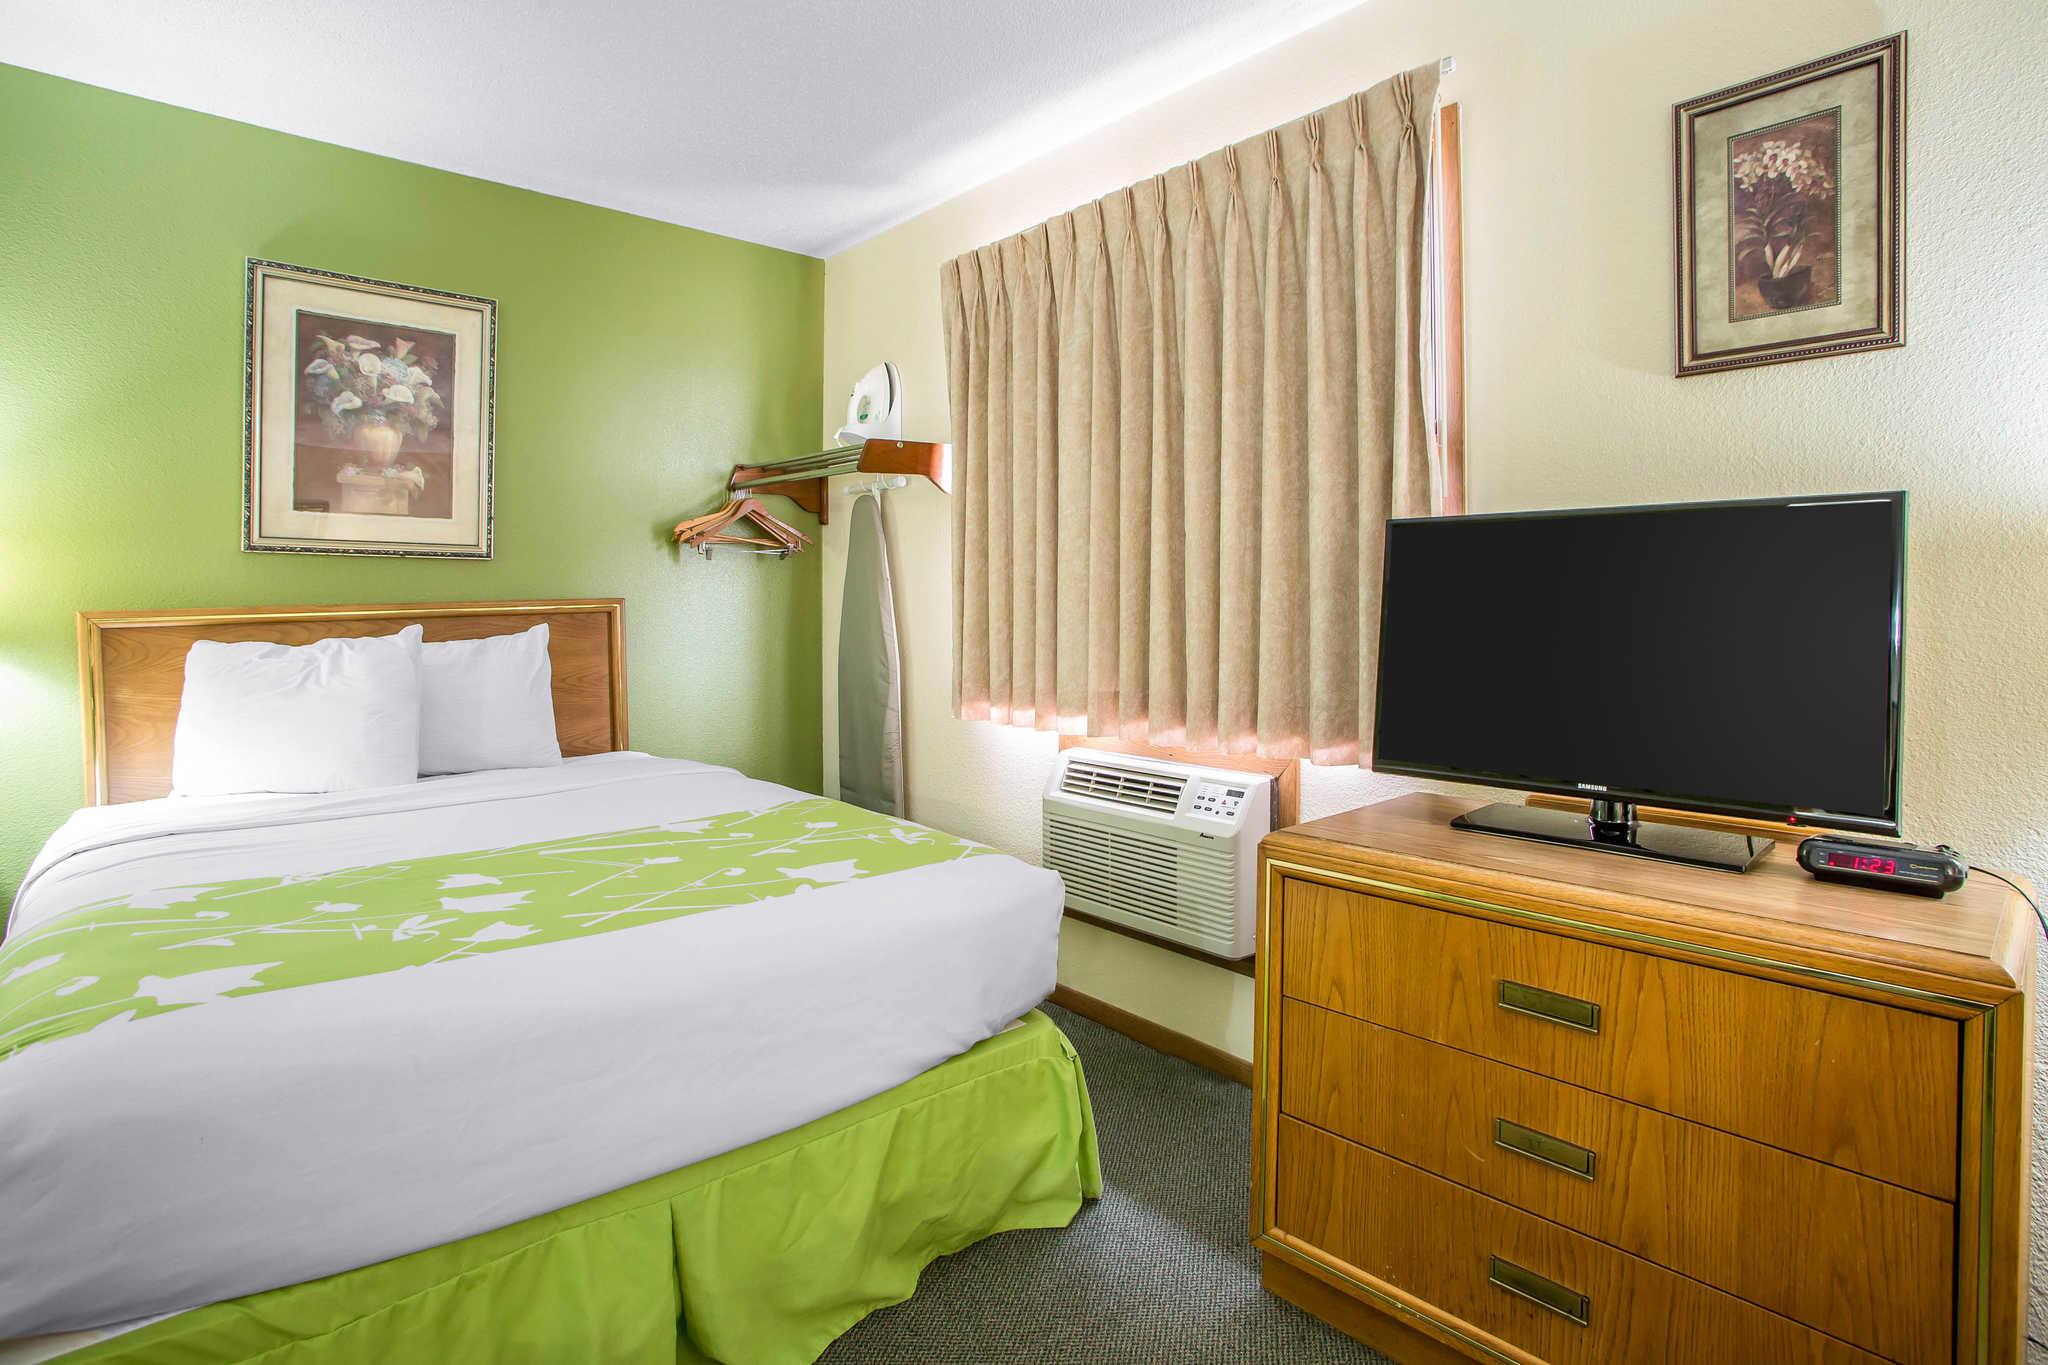 Econo Lodge  Inn & Suites image 16